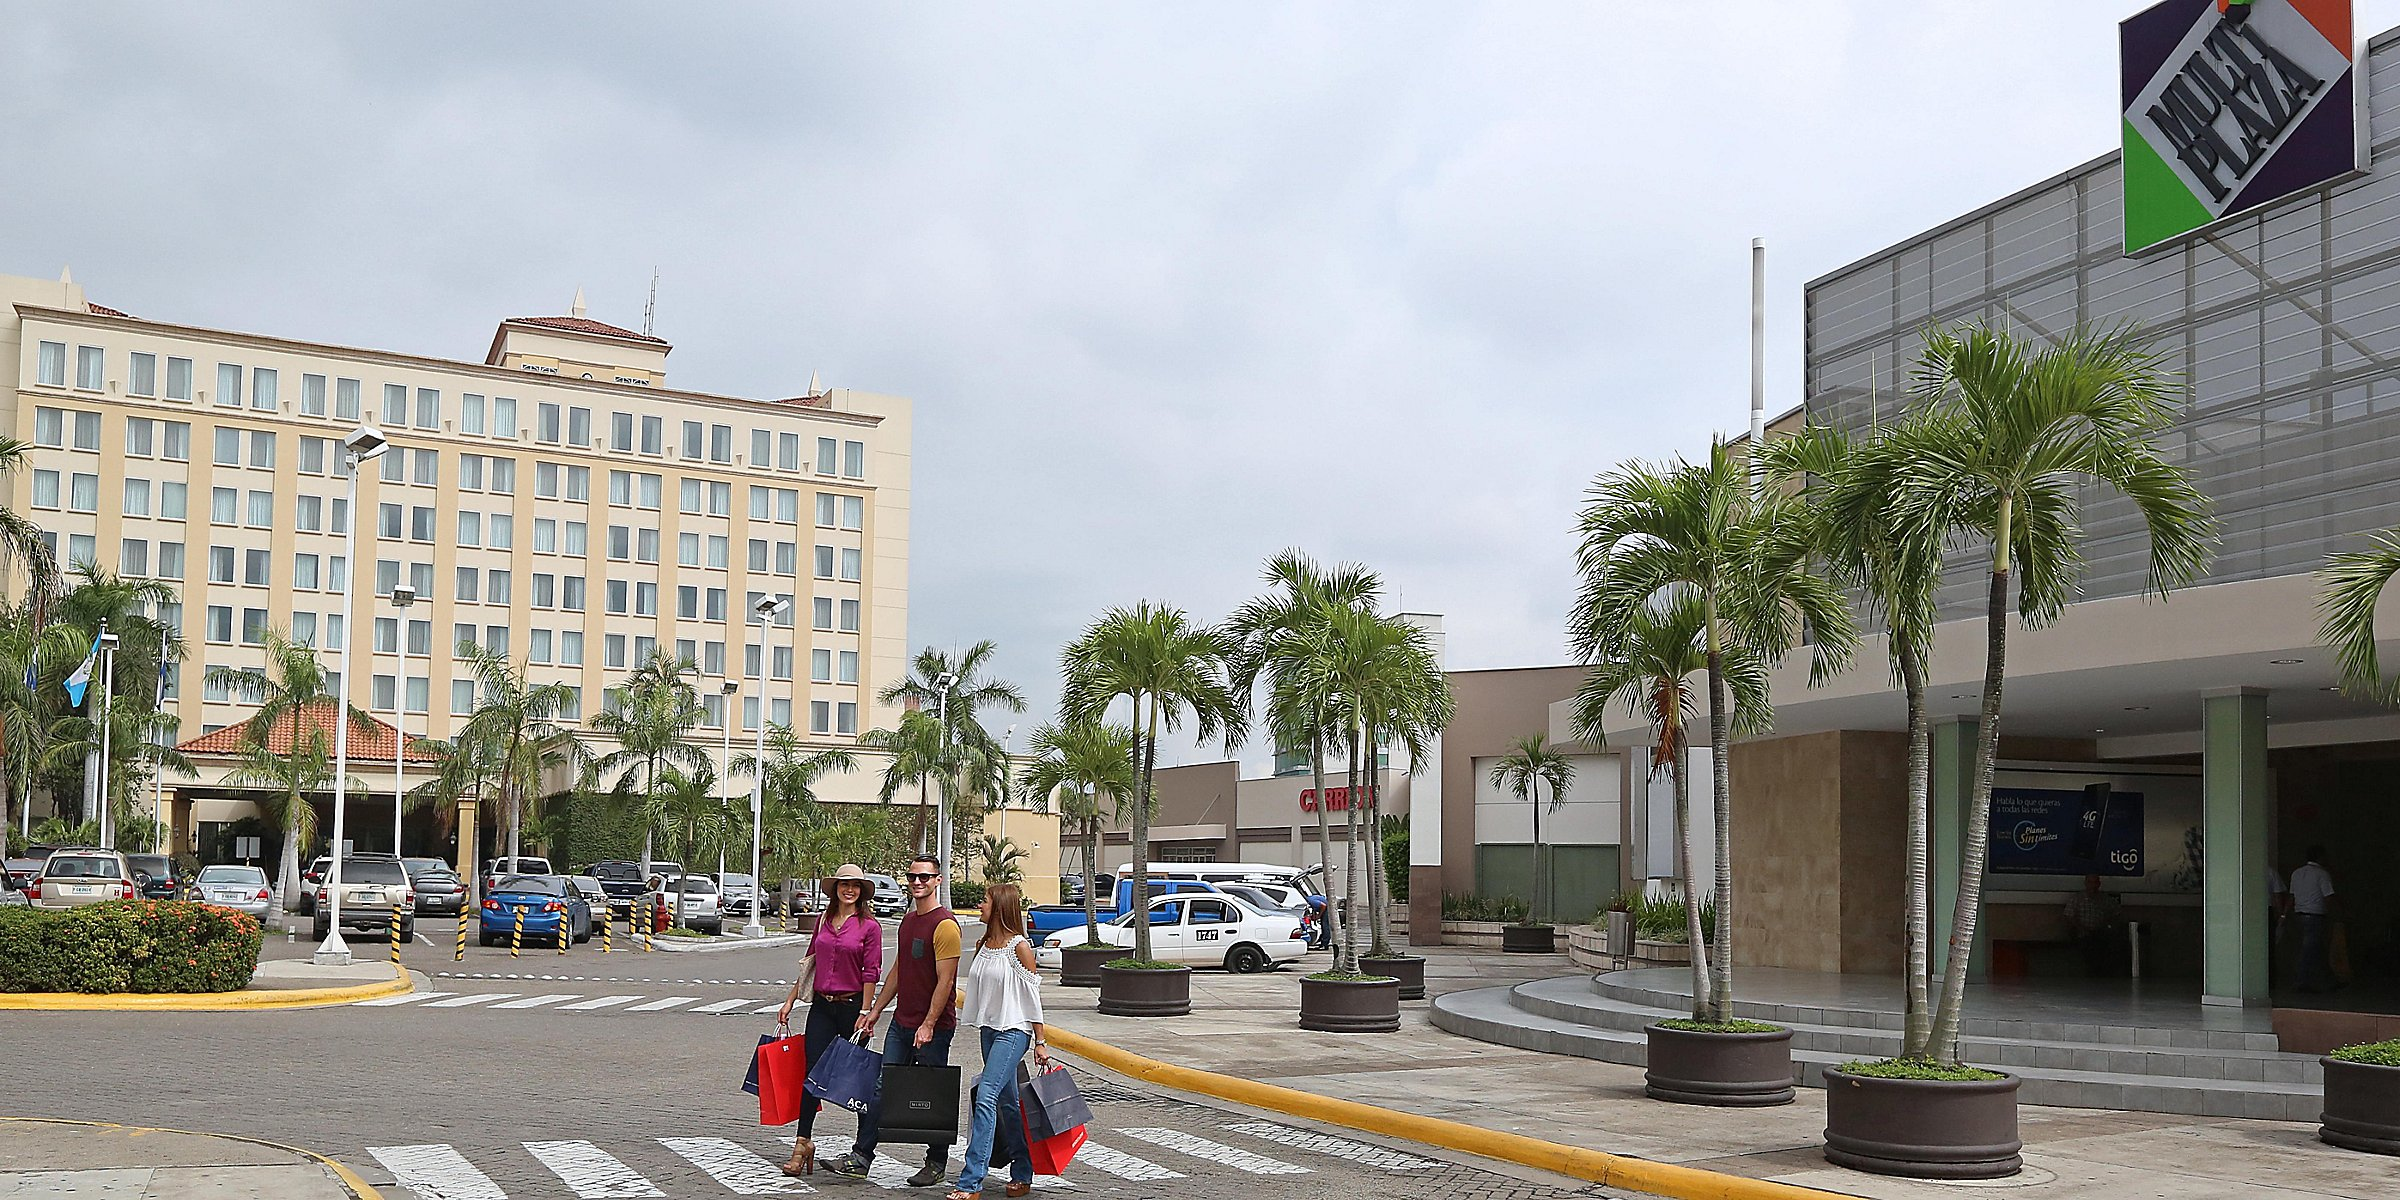 Hoteles Intercontinental Real San Pedro Sula Hoteles De Lujo En San Pedro Sula Honduras